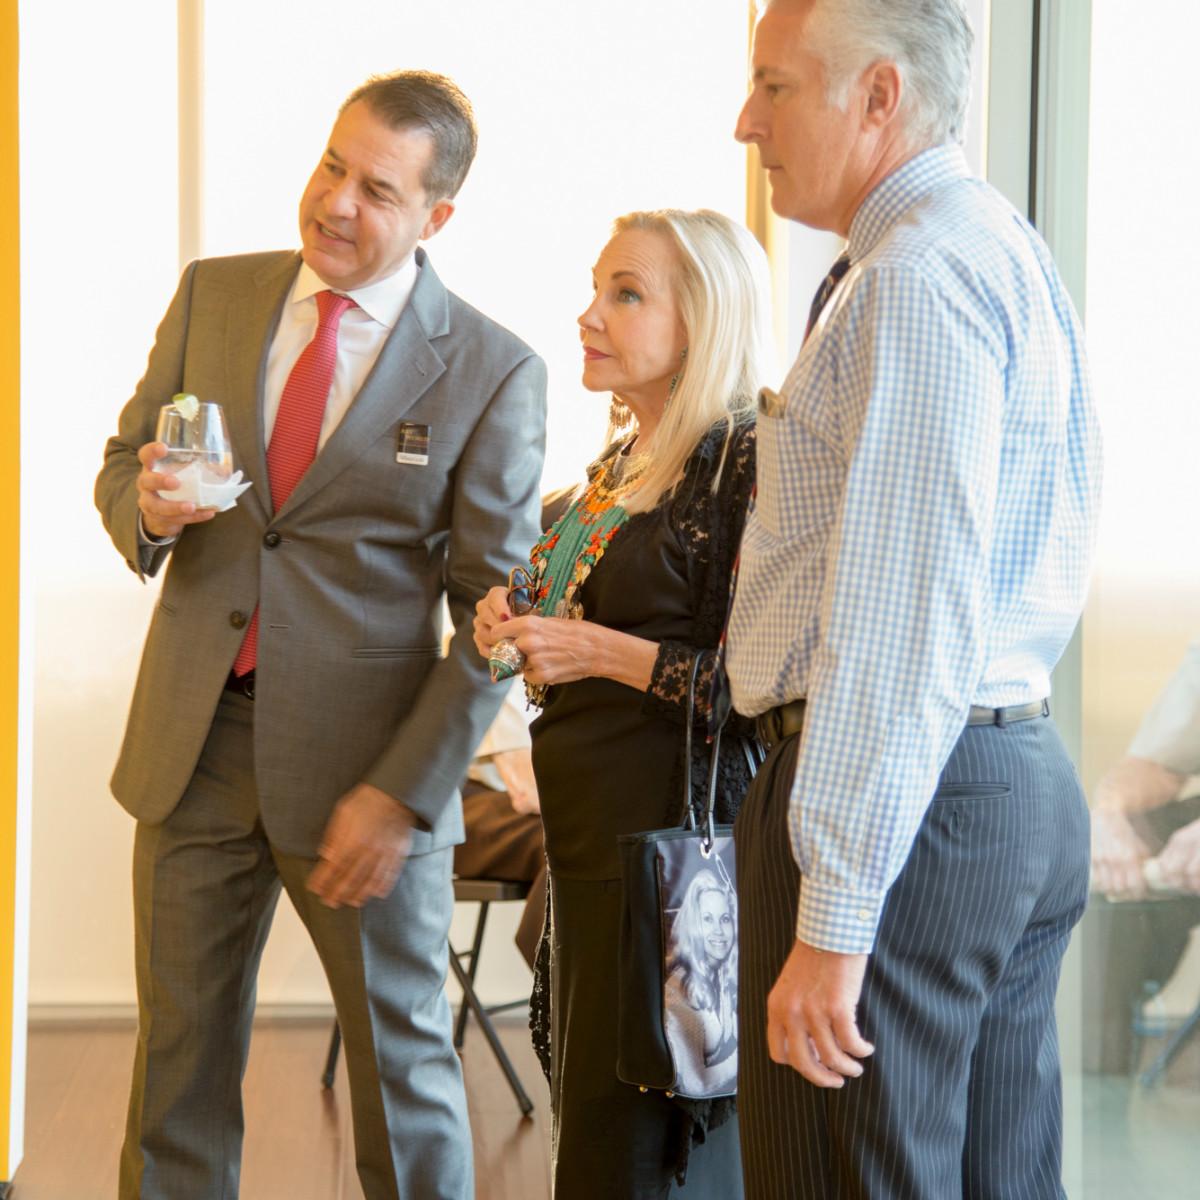 Mauricio Vallejo, Carolyn Farb and Brian Spack